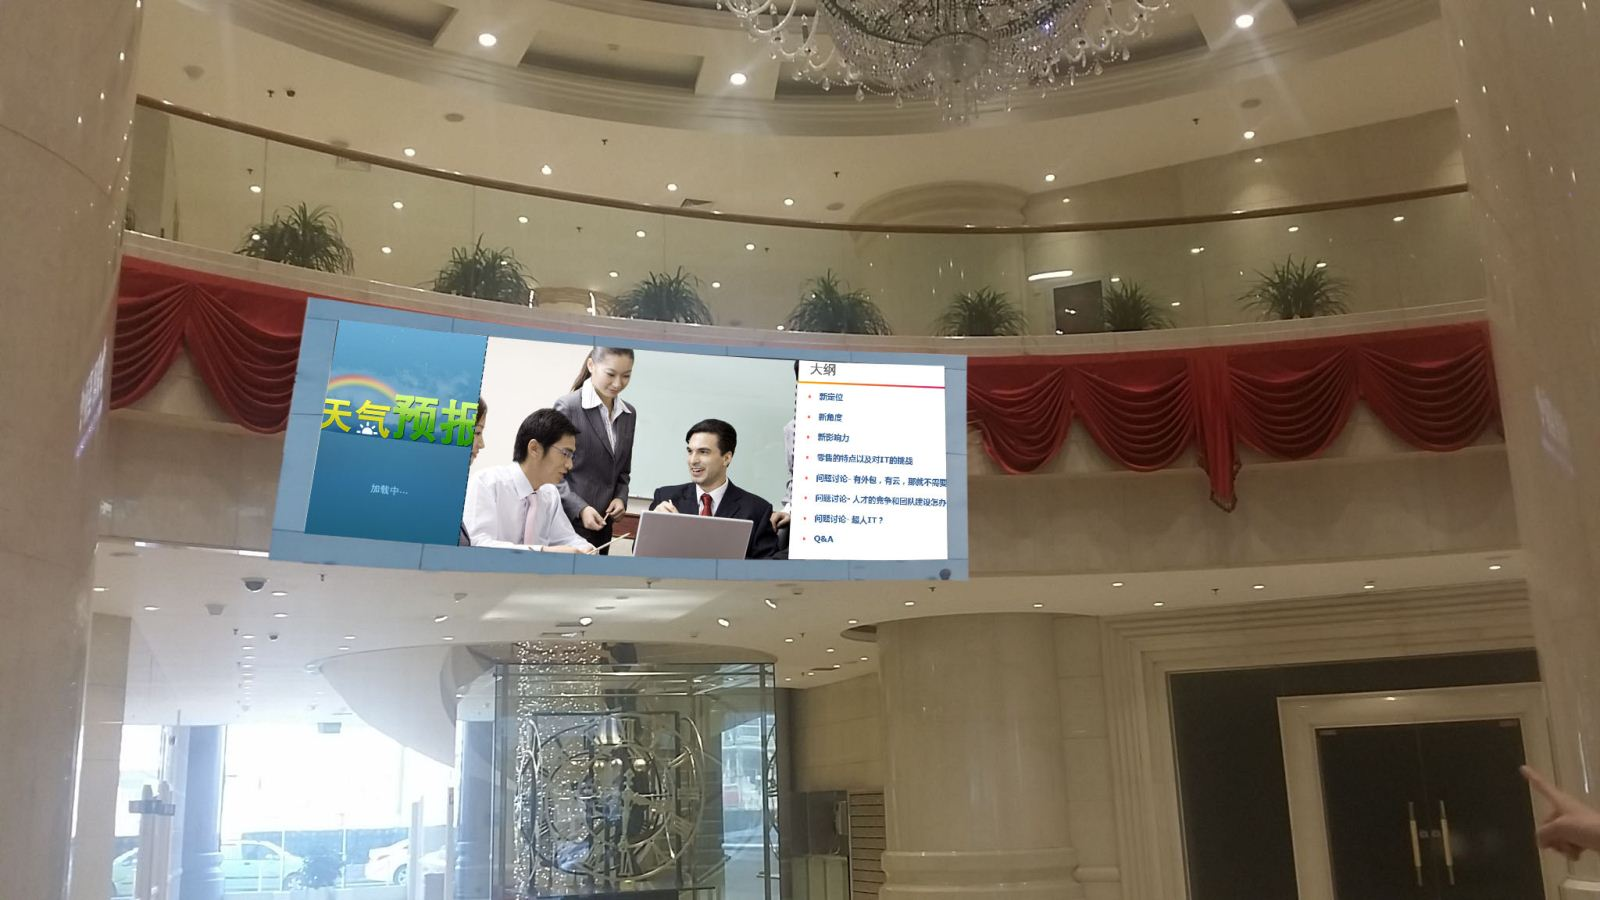 場景五:大廳空庭LED顯示屏